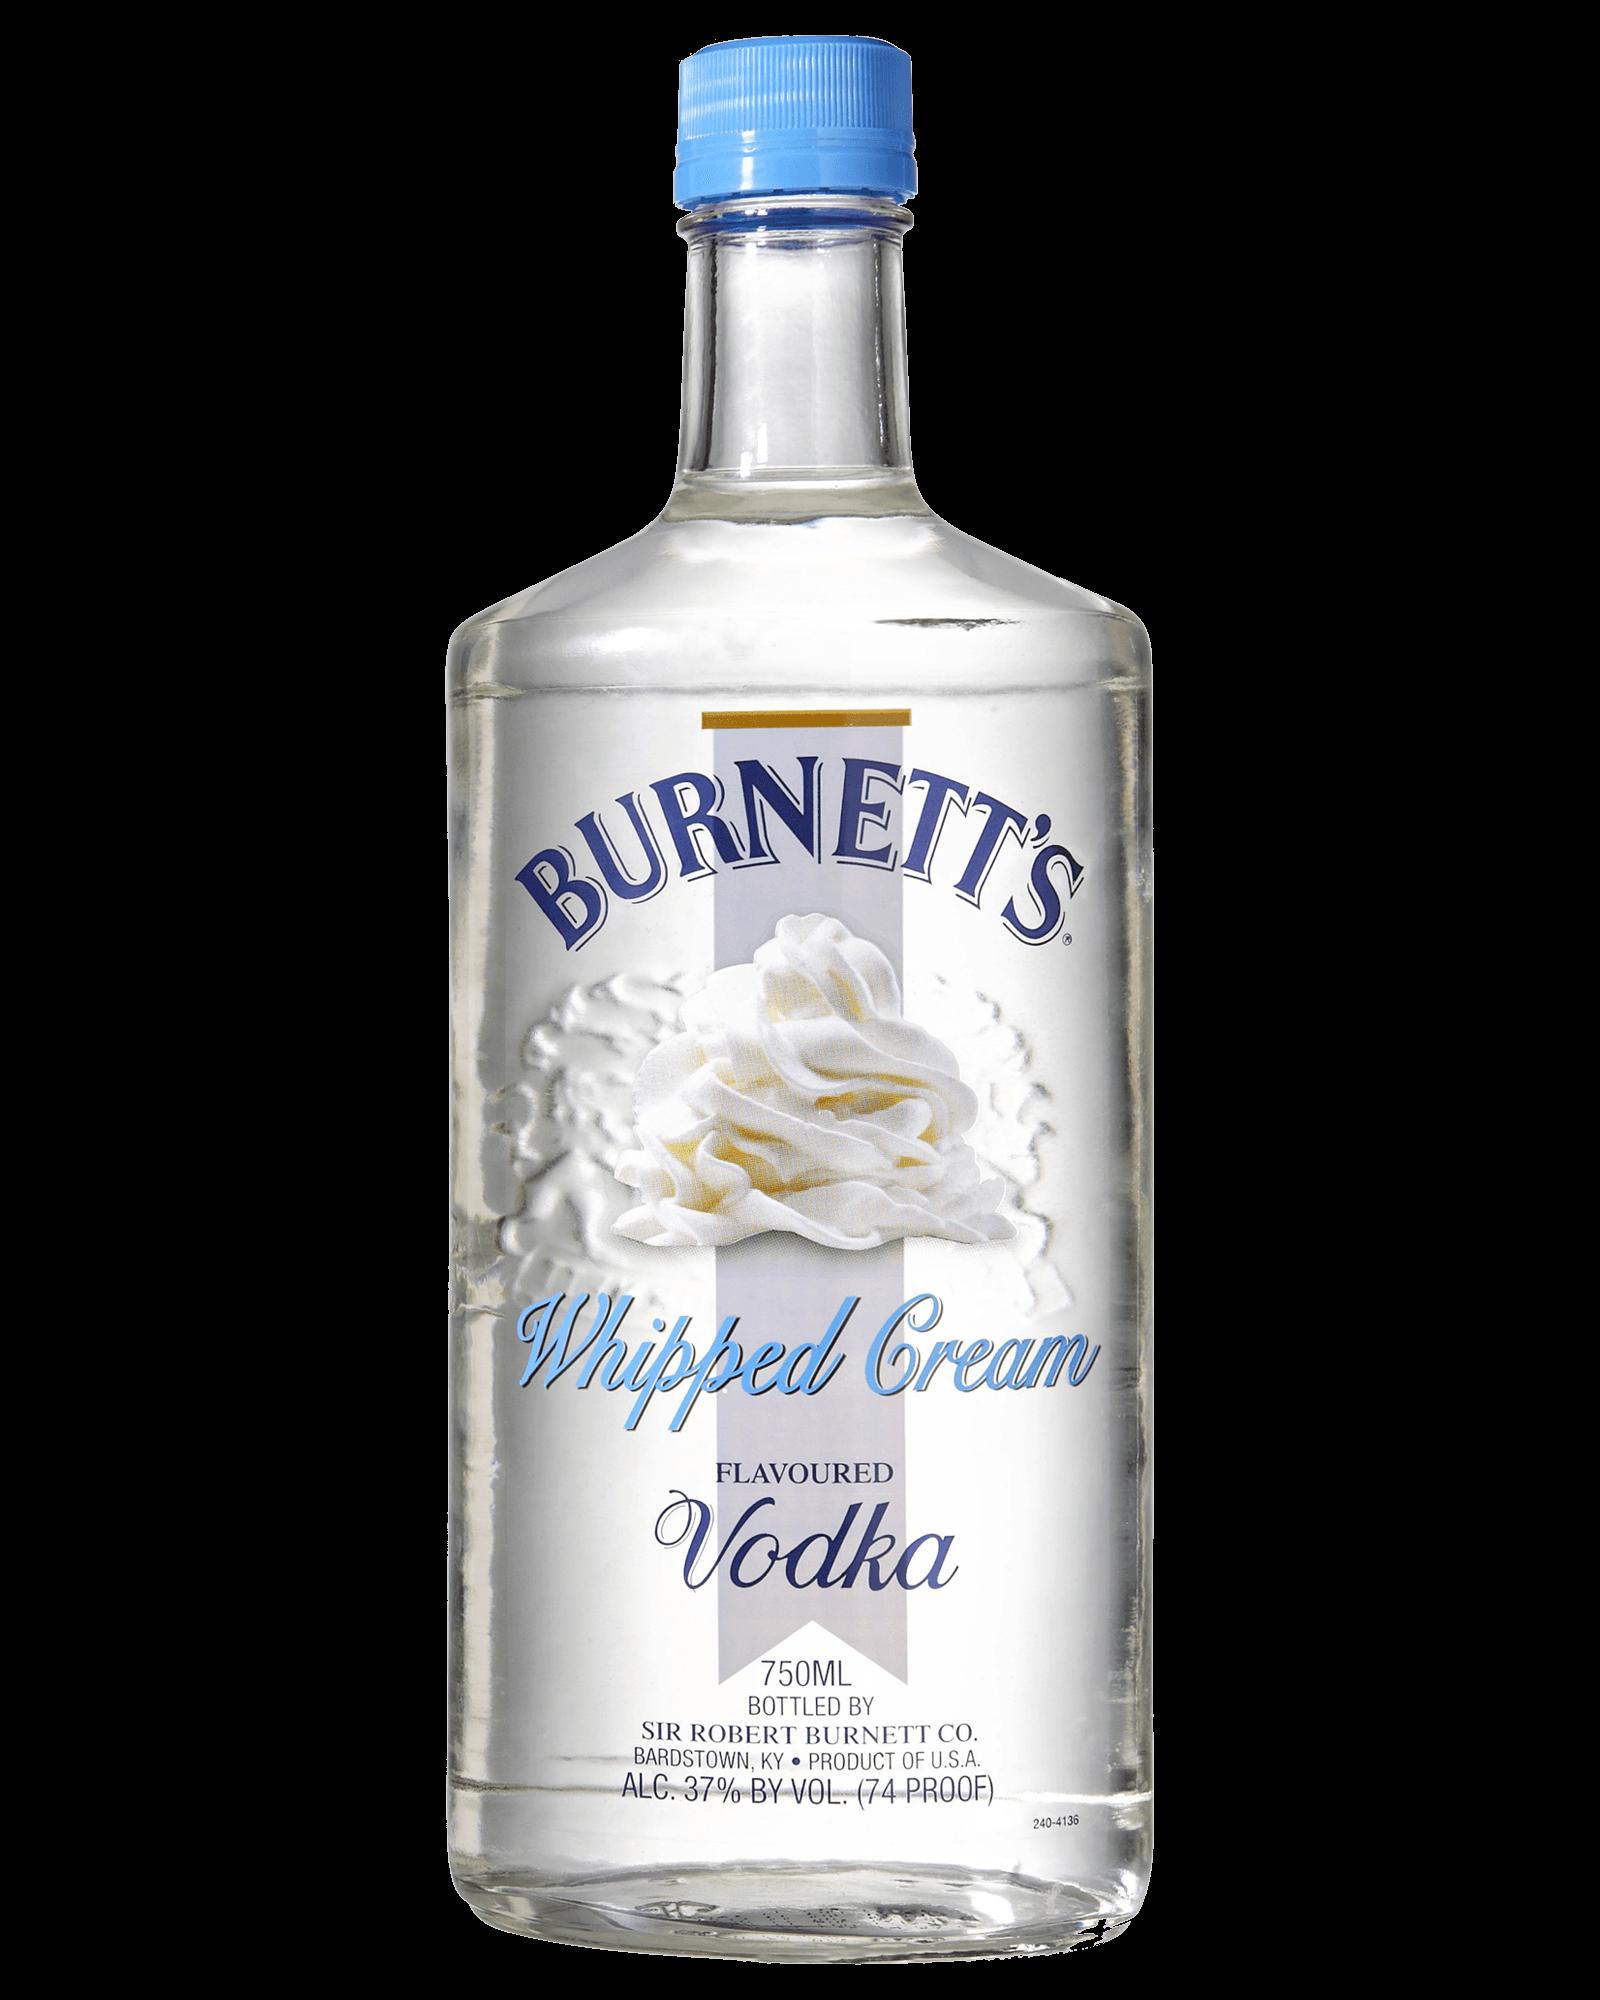 Burnett's Whipped Cream Flavoured Vodka 750mL (With Images